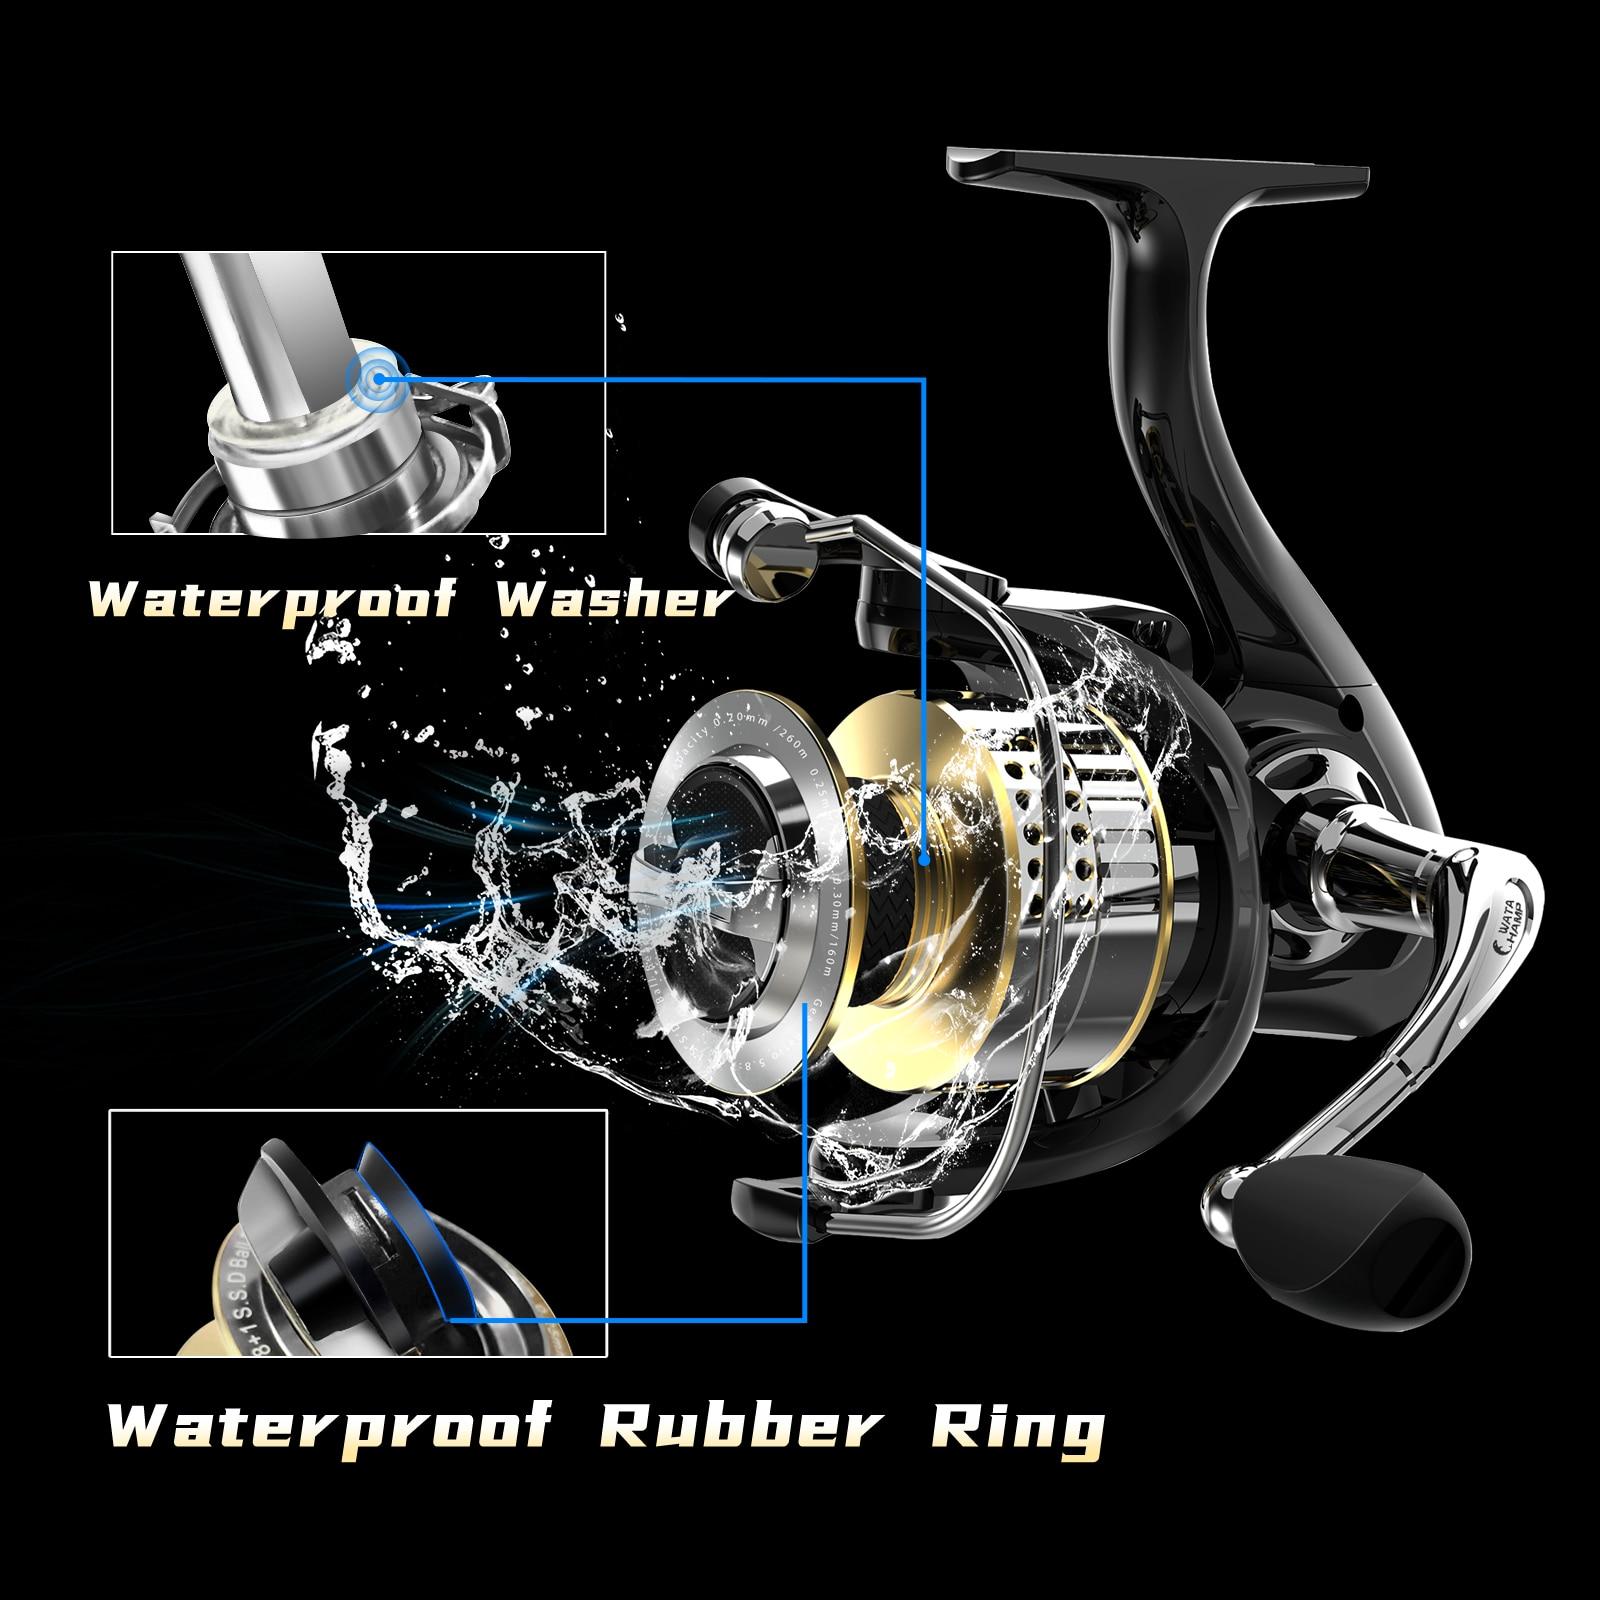 WataChamp Shield Fishing Reel, 8+1 Stainless Steel Ball Bearings 20 kg Drag Carbon Fiber Drag for Bass Saltwater Fishing Coil enlarge